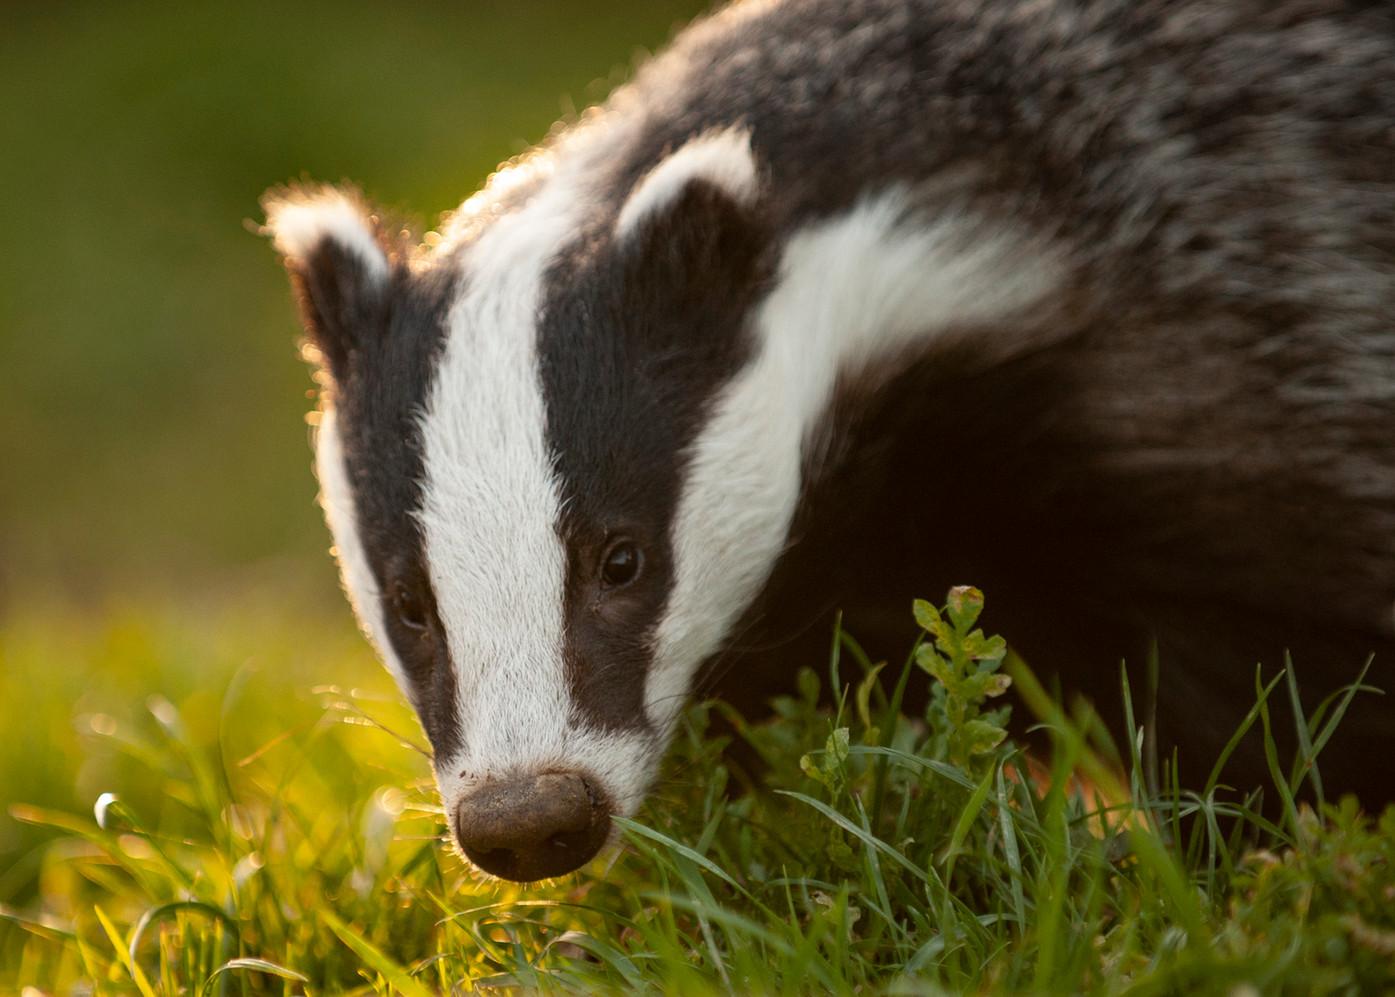 2010.10.08_BWC_British Wildlife Centre_1